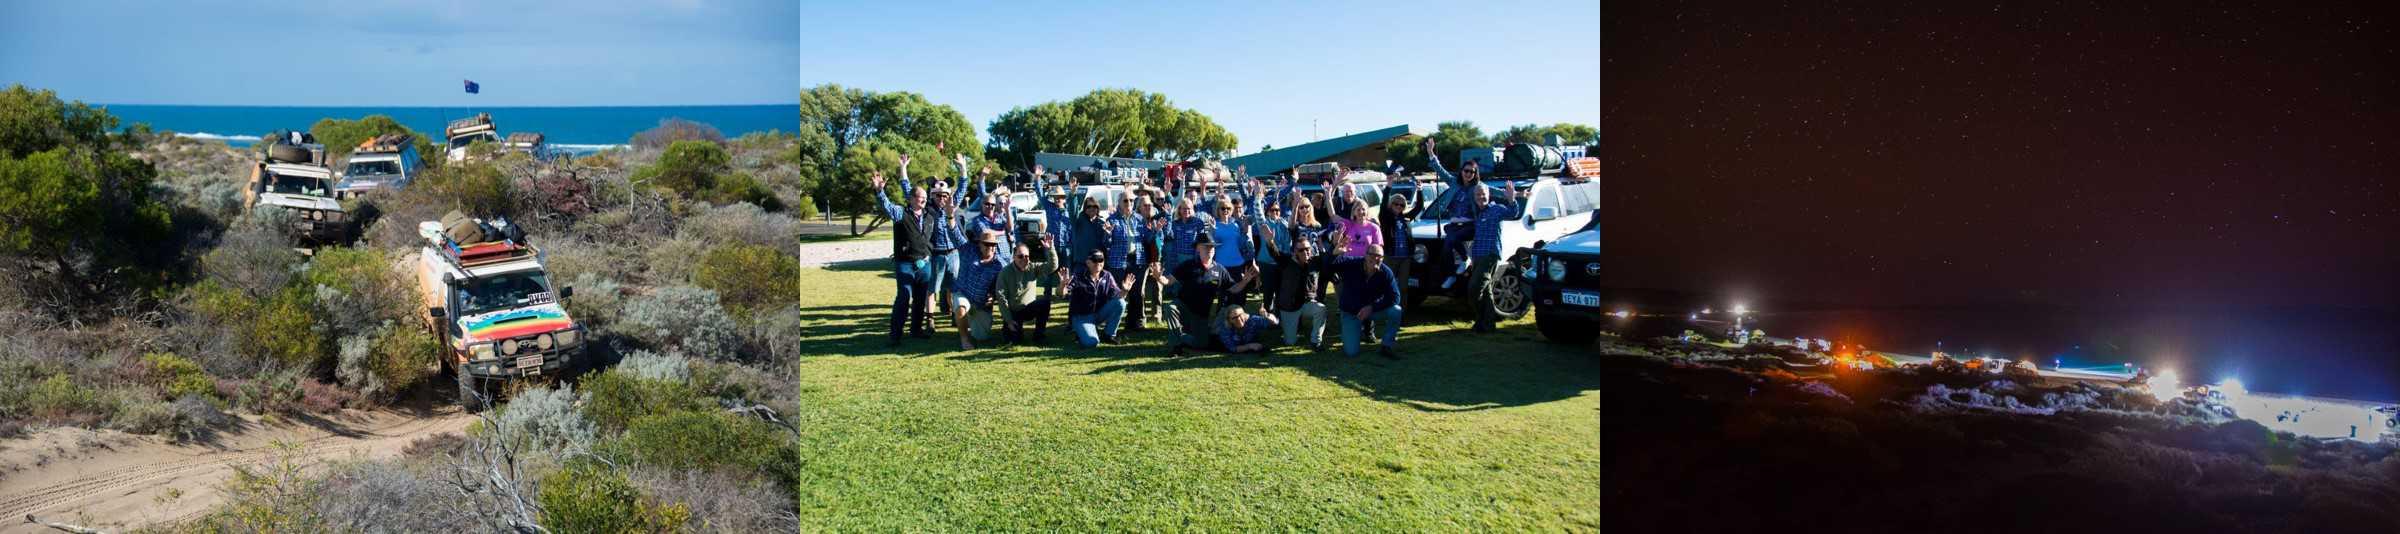 Dongara to Dirk Hartog 4WD Trip